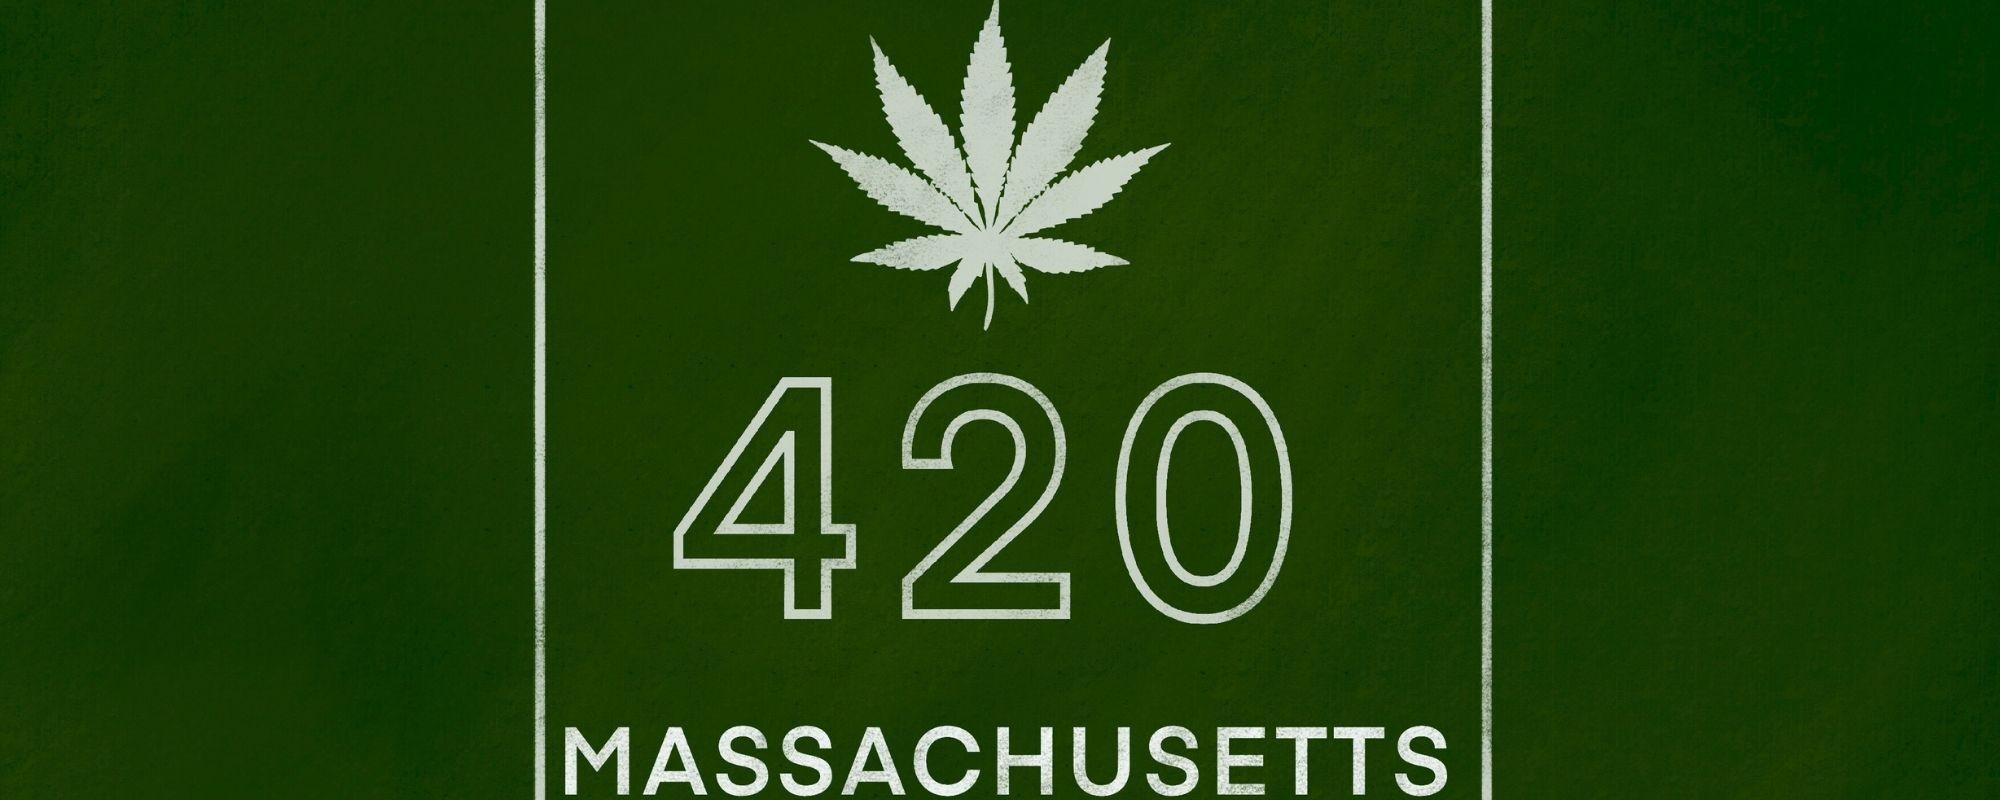 Massachusetts 420 card